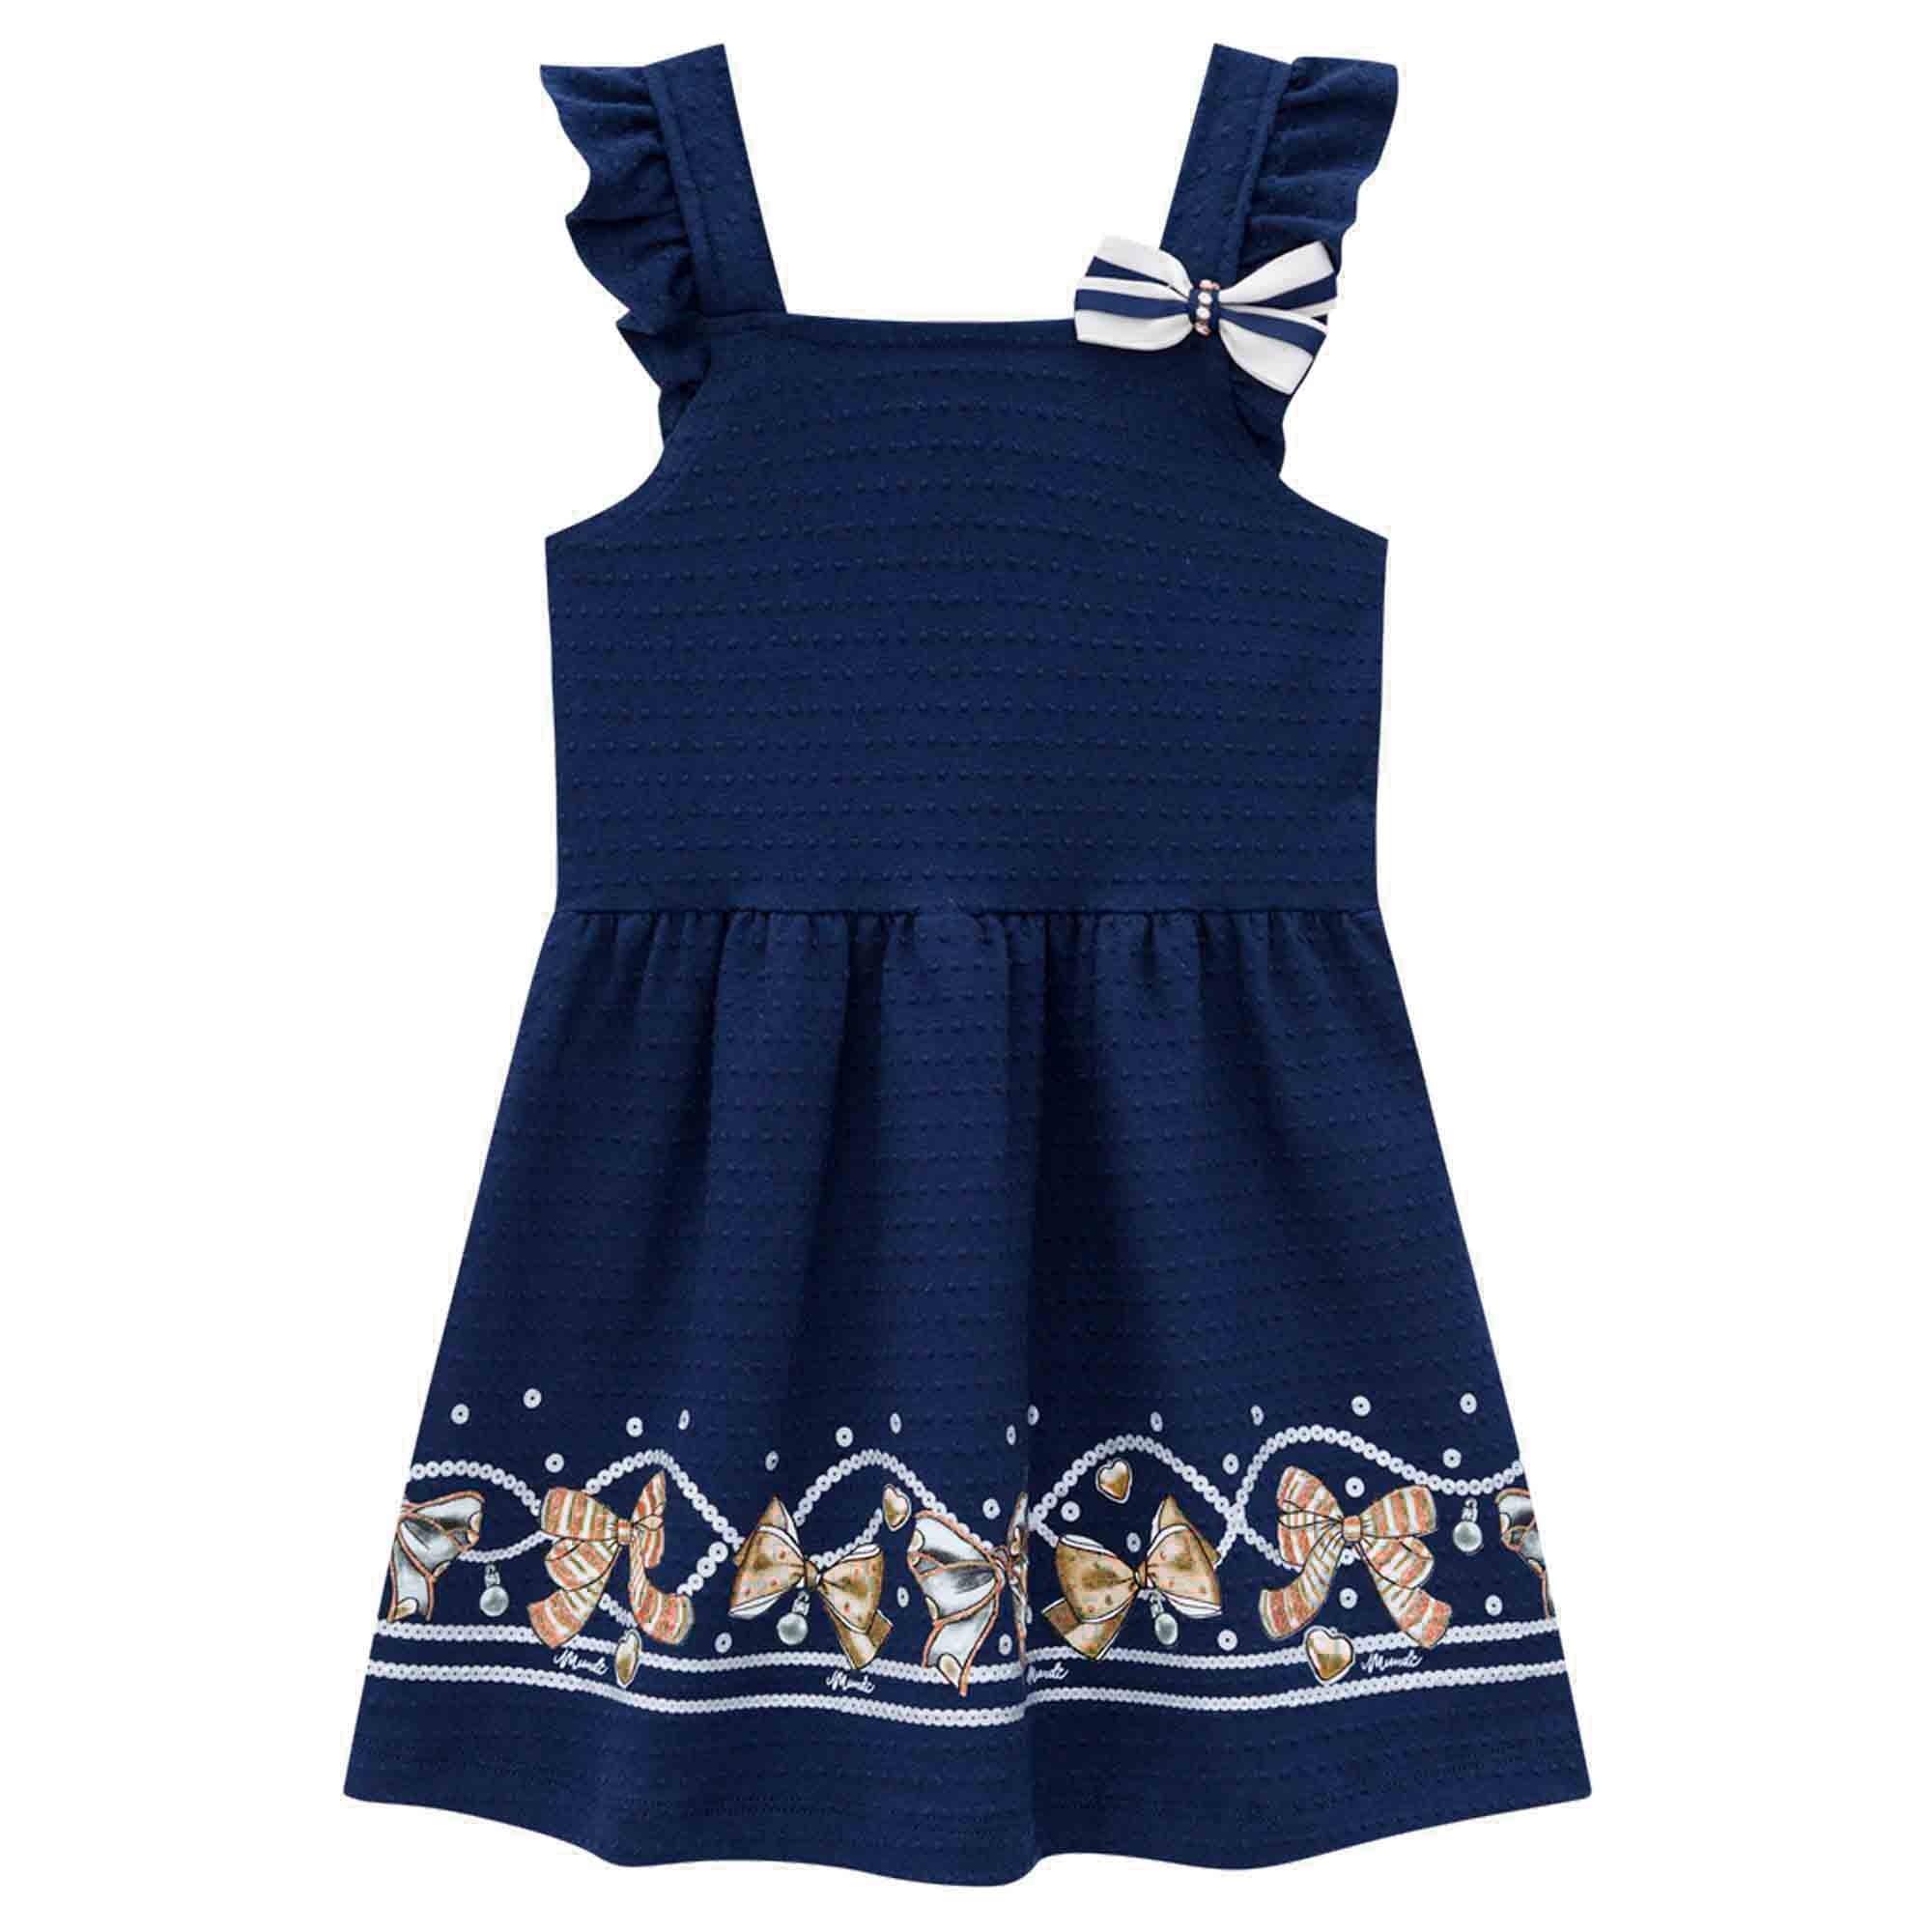 Vestido Verão Brandili Mundi Laços - 1 ao 3